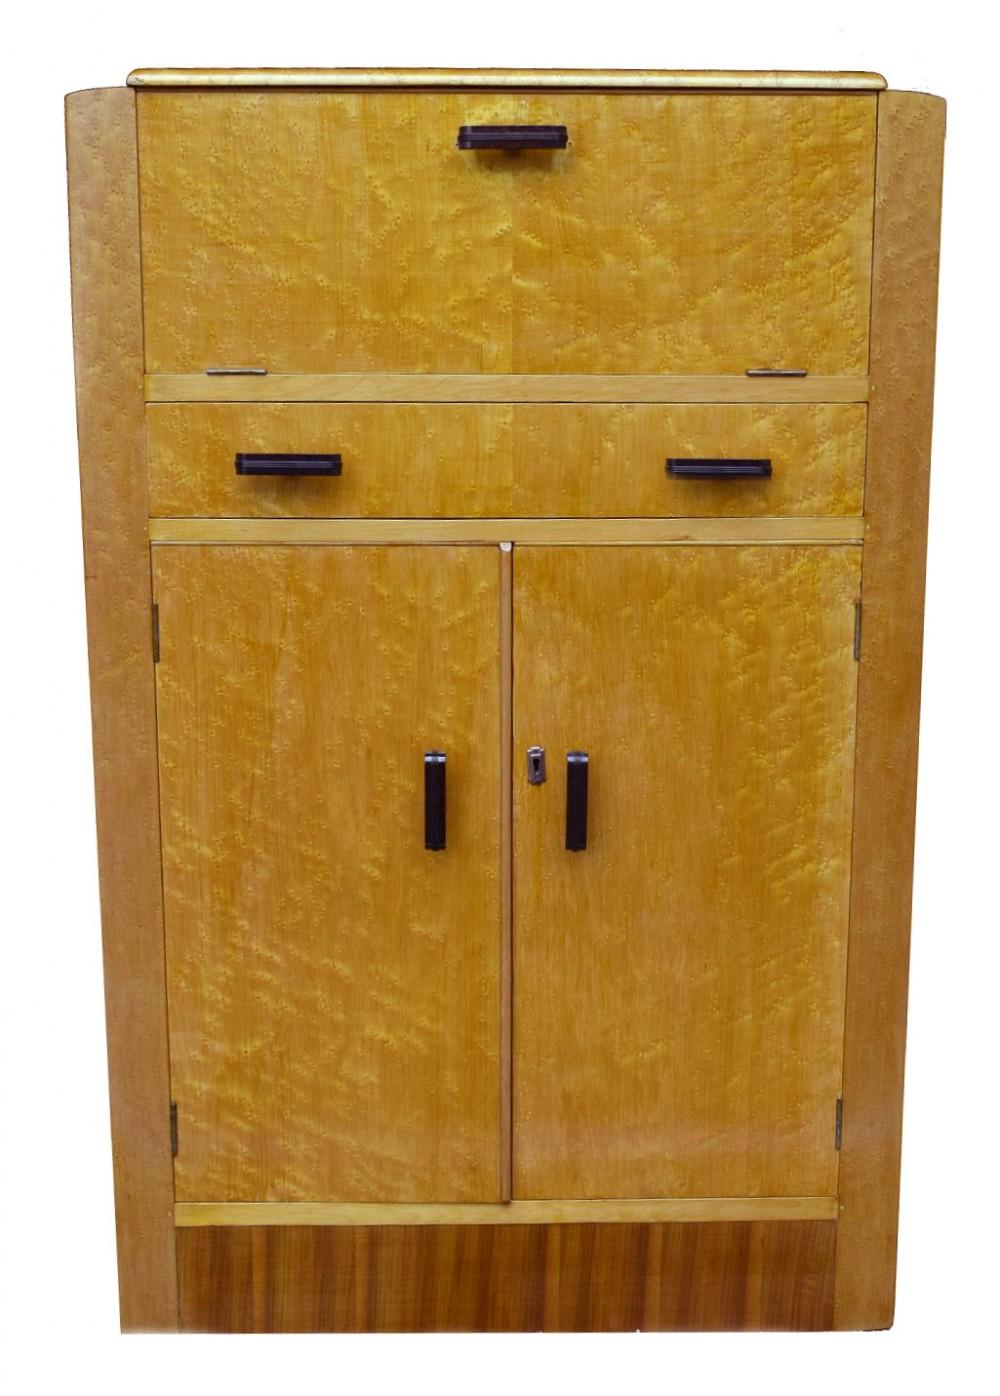 art deco blonde birdseye maple cocktail cabinet c1930's